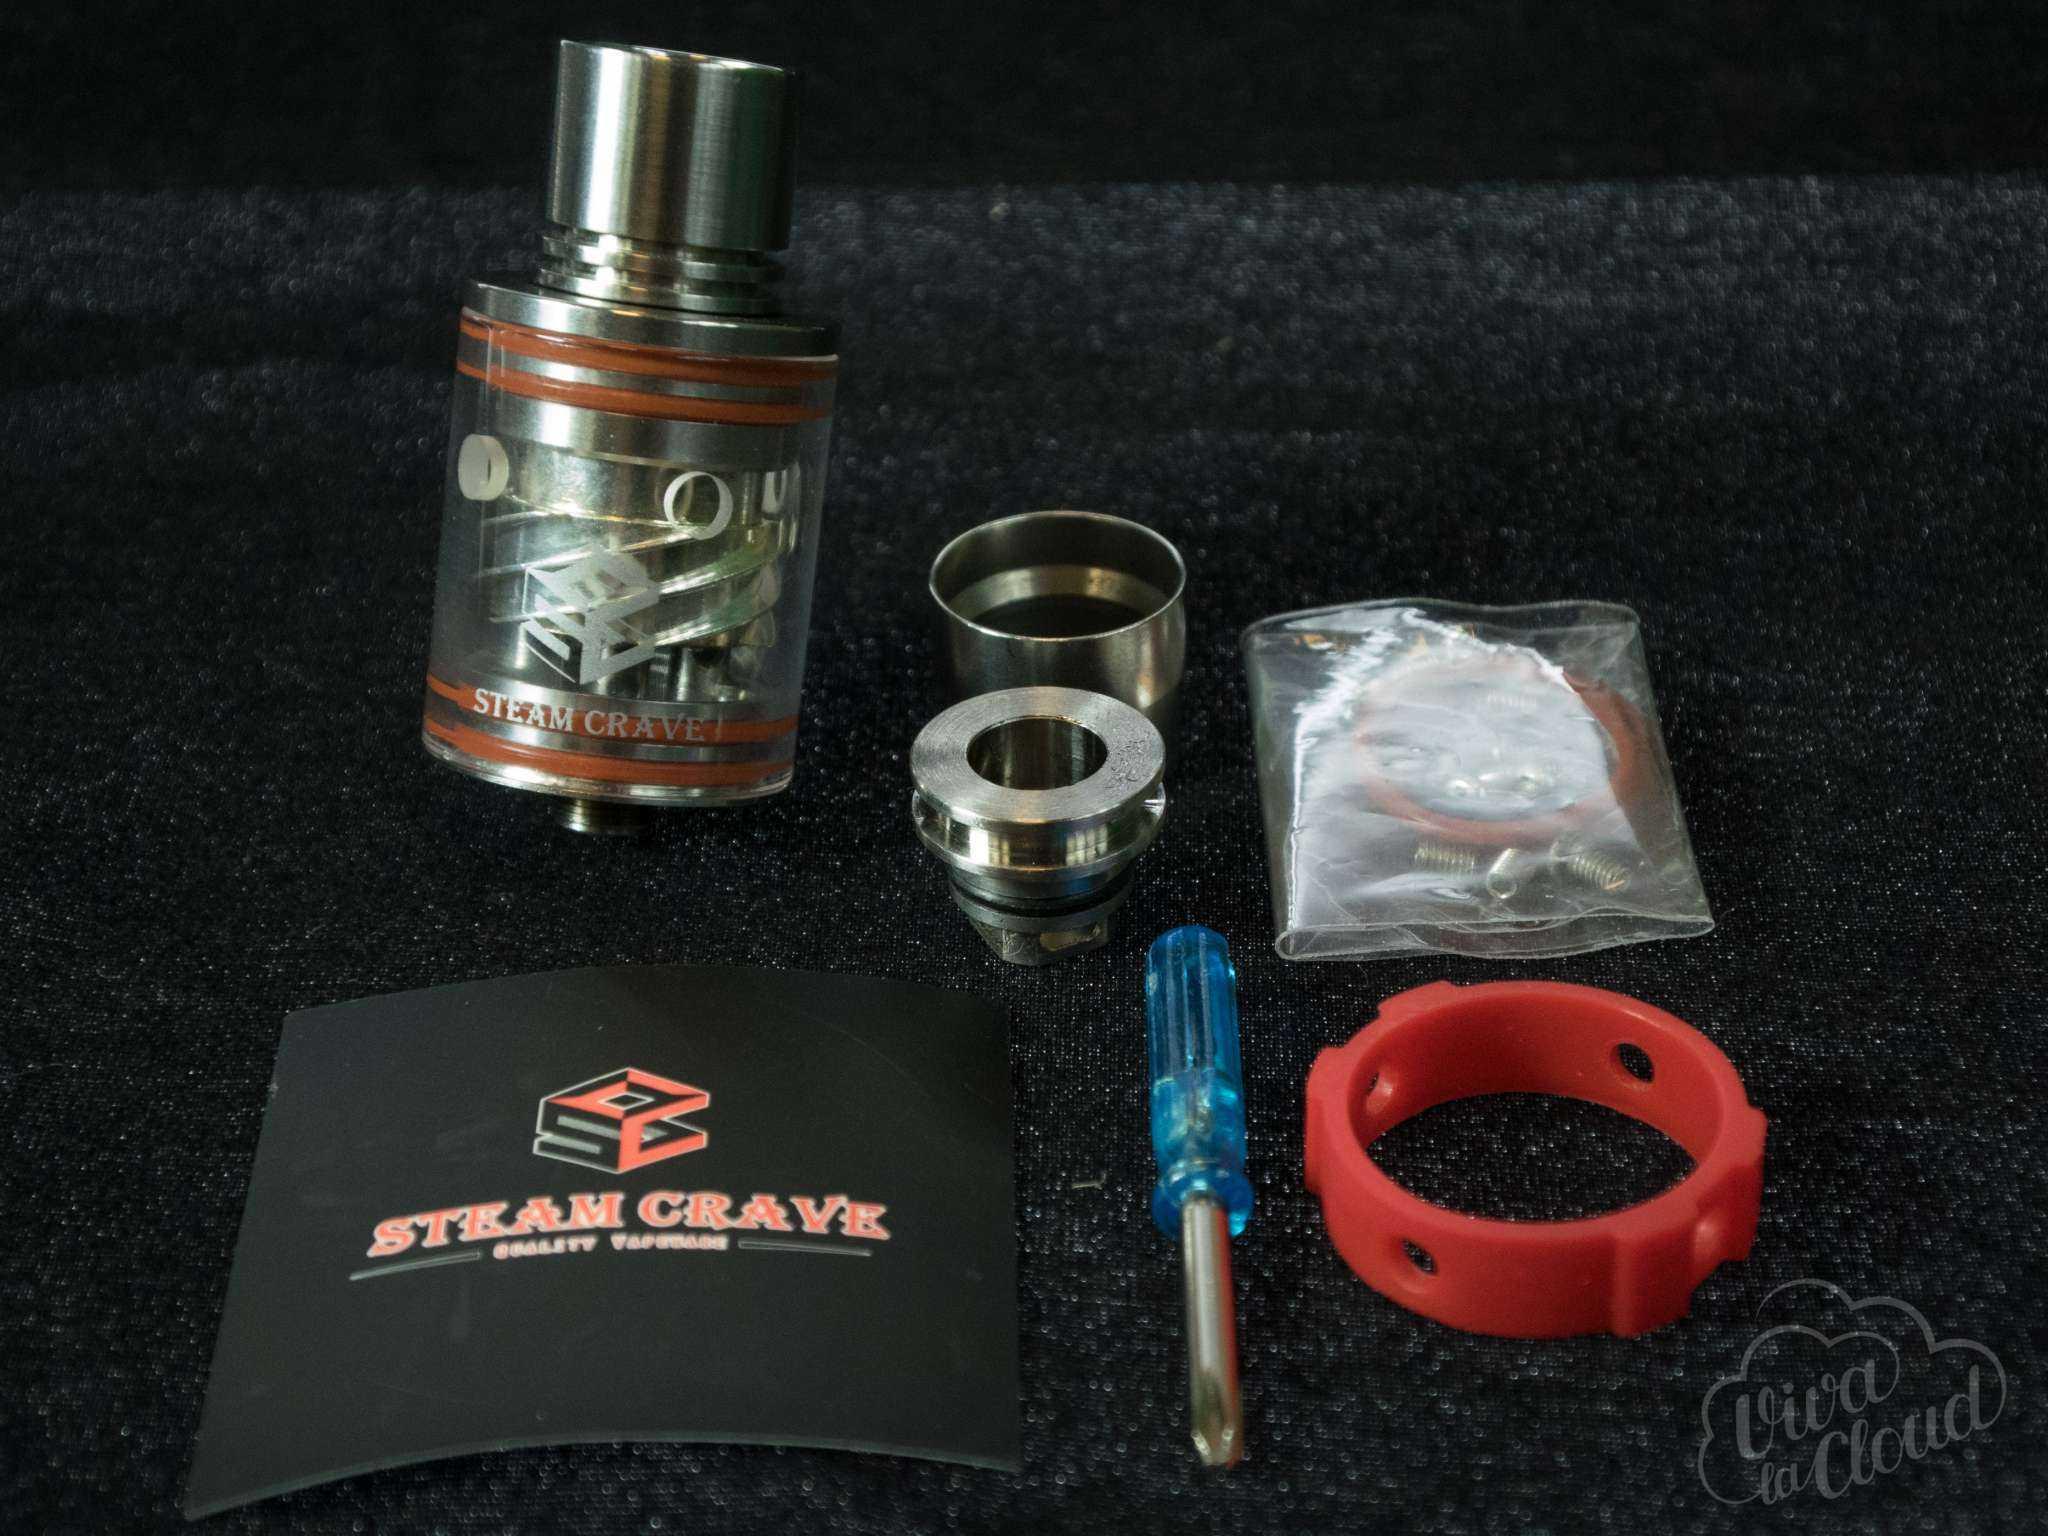 Steam Crave Squonk Setup